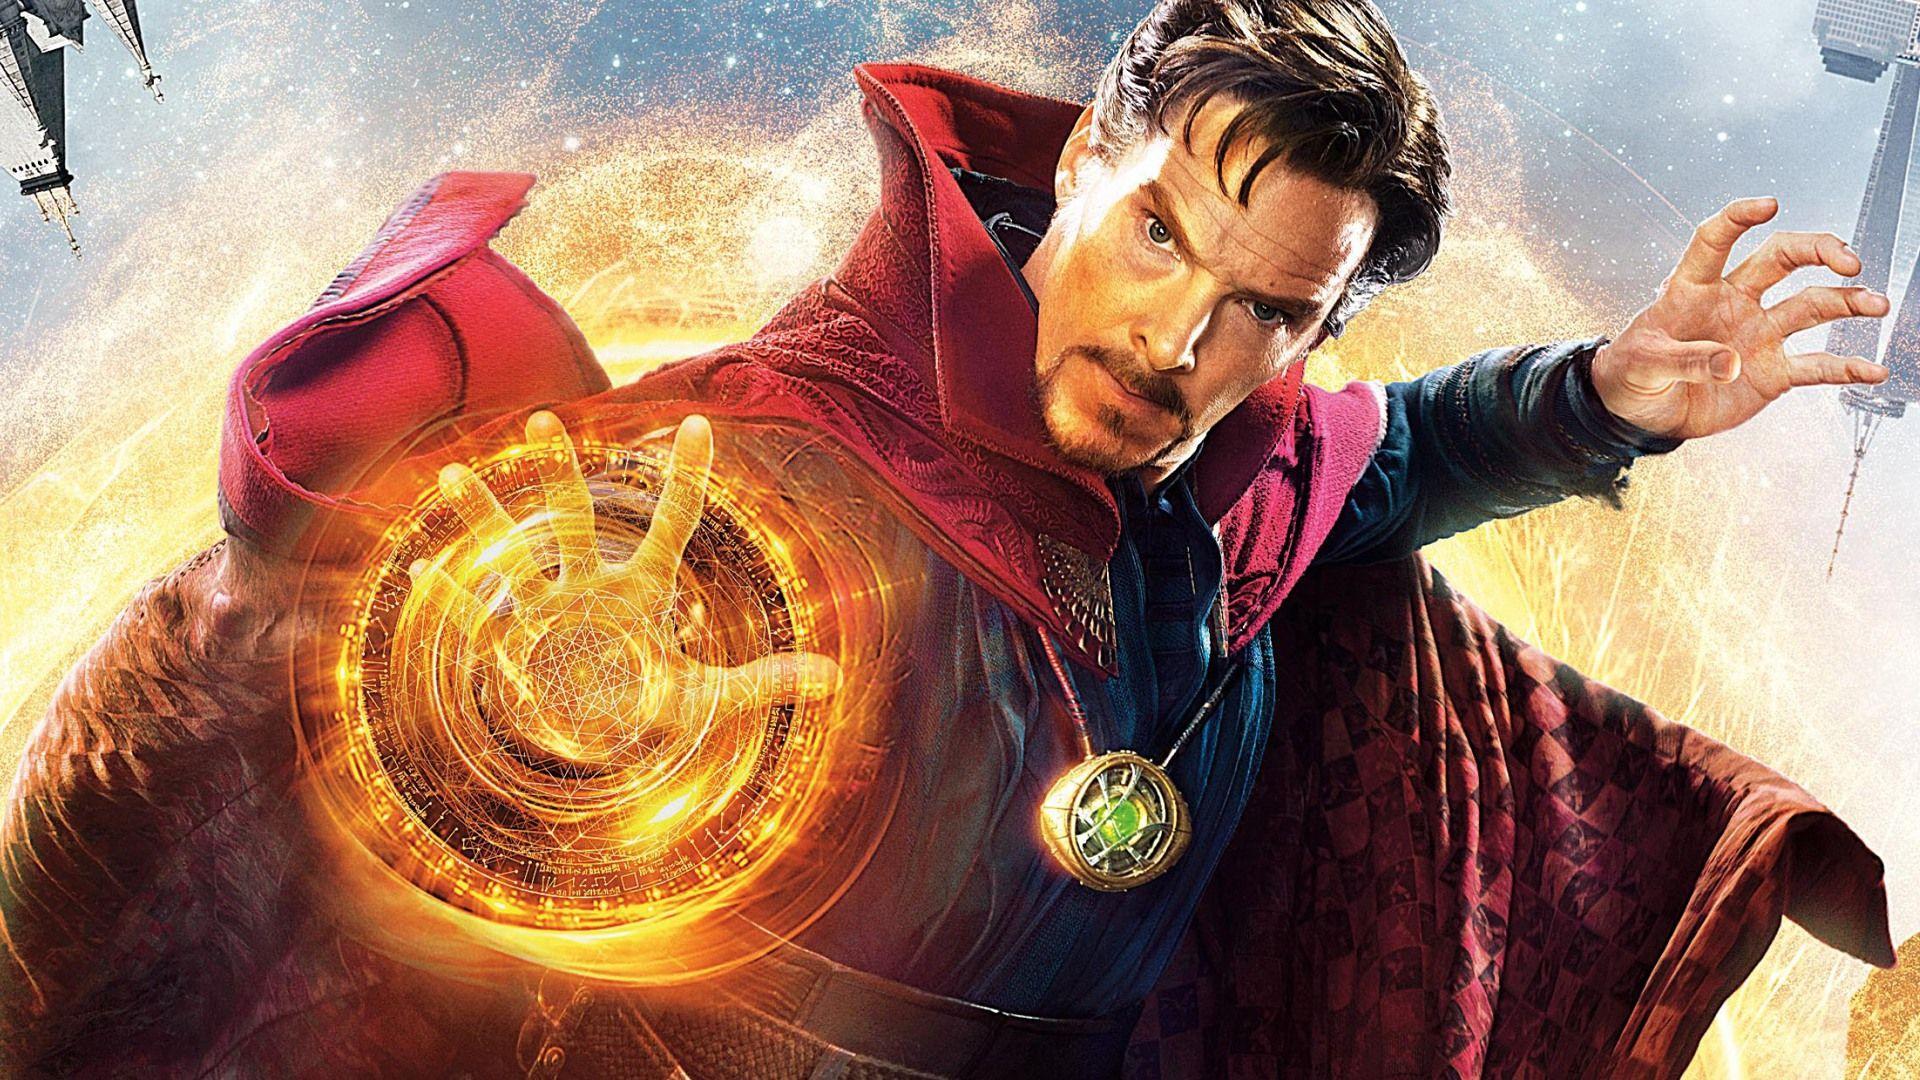 Doctor Strange Marvel Movie Wallpapers Widescreen Cinema: Doctor Strange Wallpapers HD